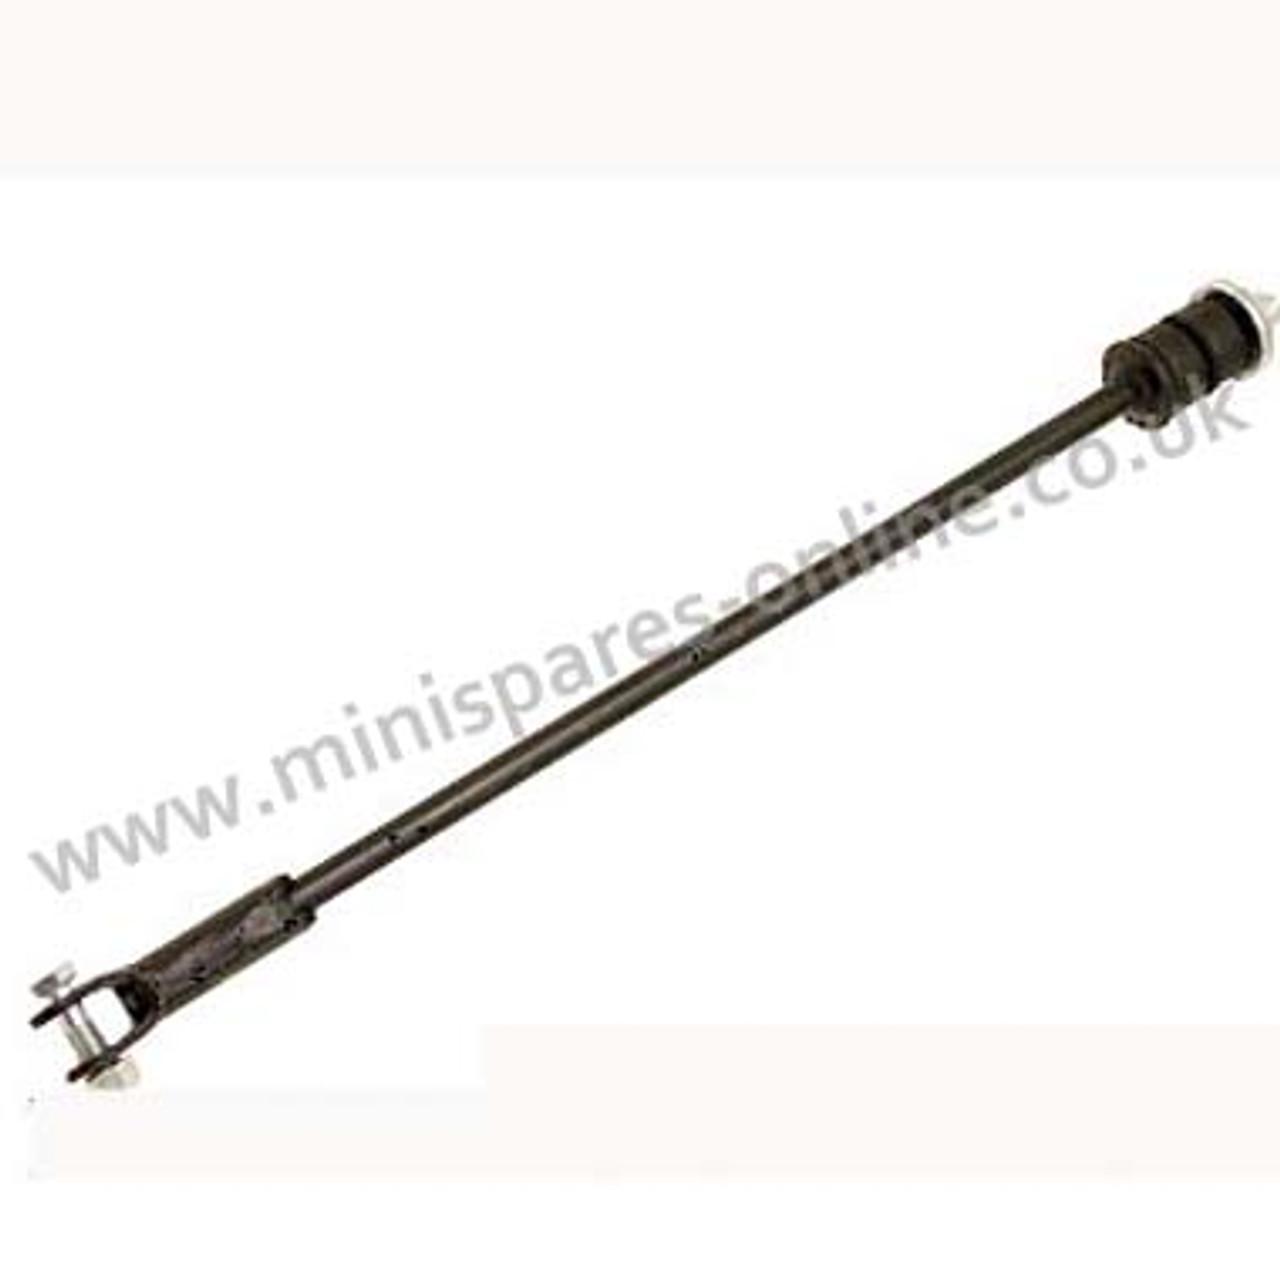 Std tie rod/bar